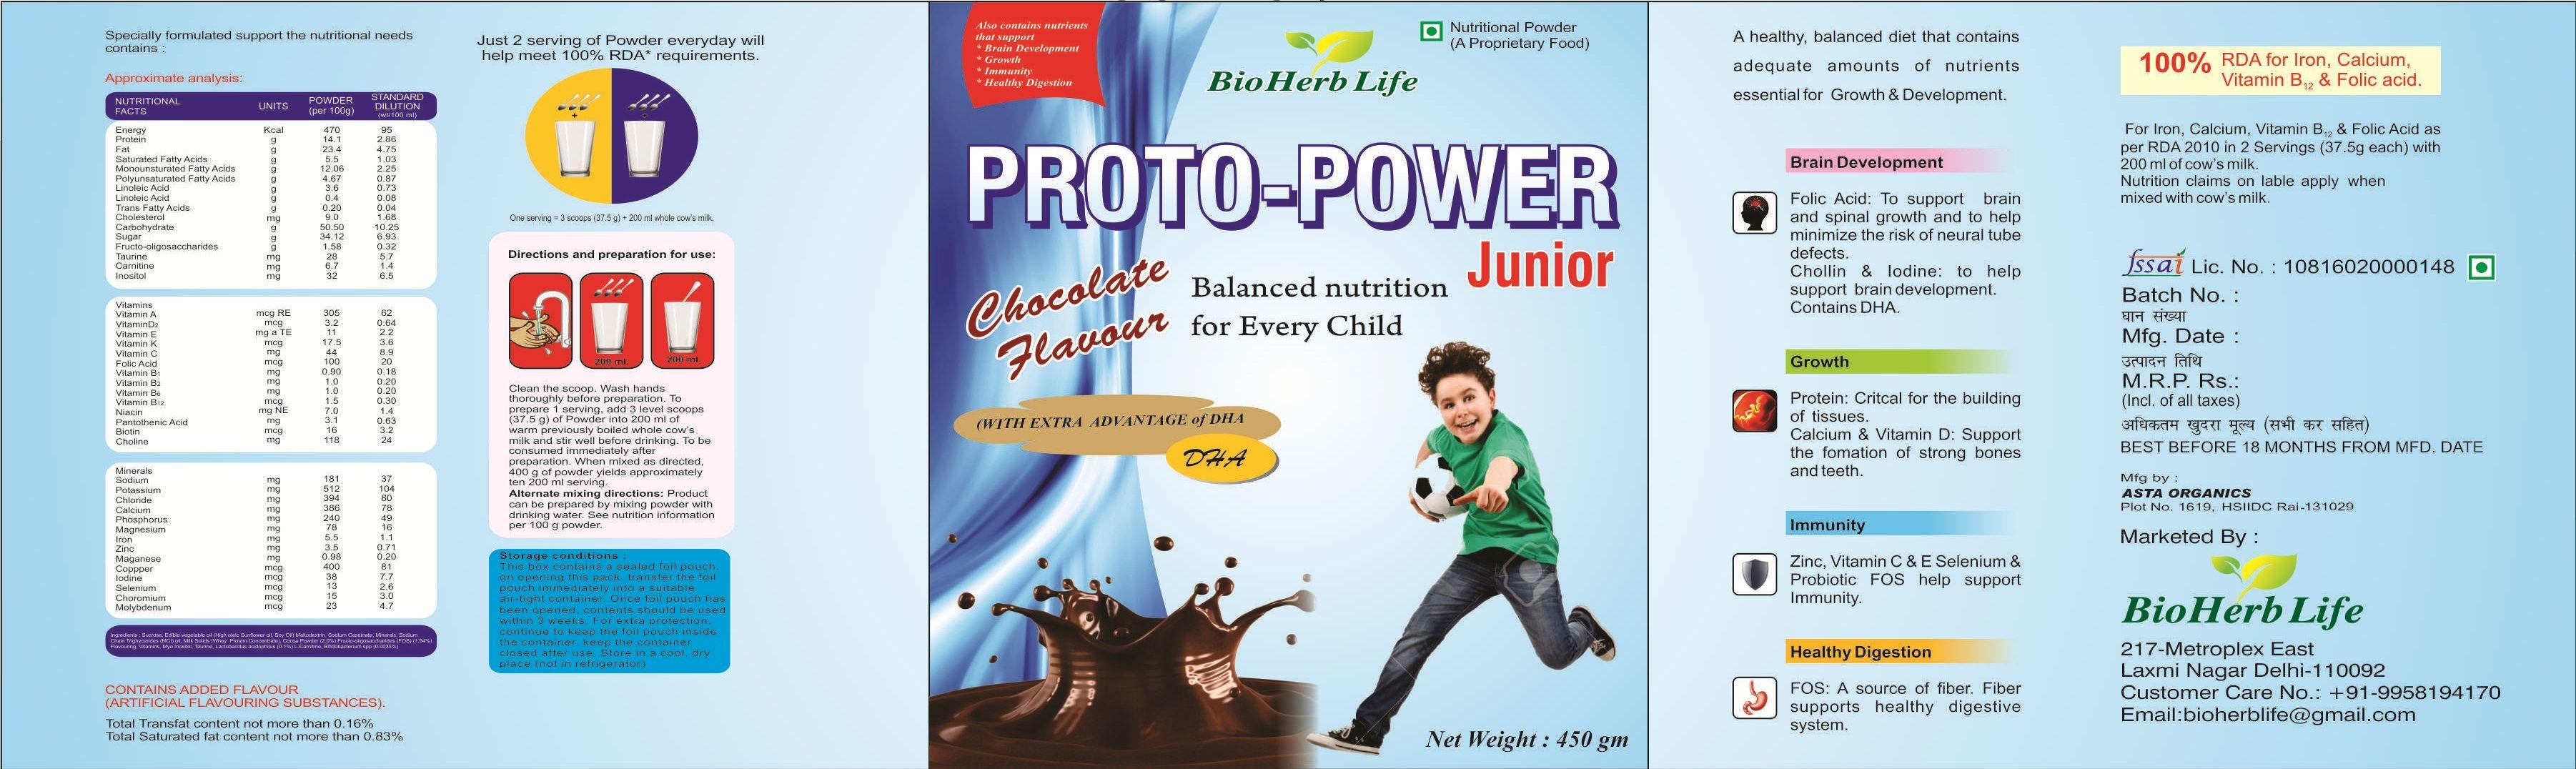 Care exporter health herbal product - Ayurvedic Herbal Products Manufacturers In Delhi Bio Herb Life Pvt Ltd Major Exporters